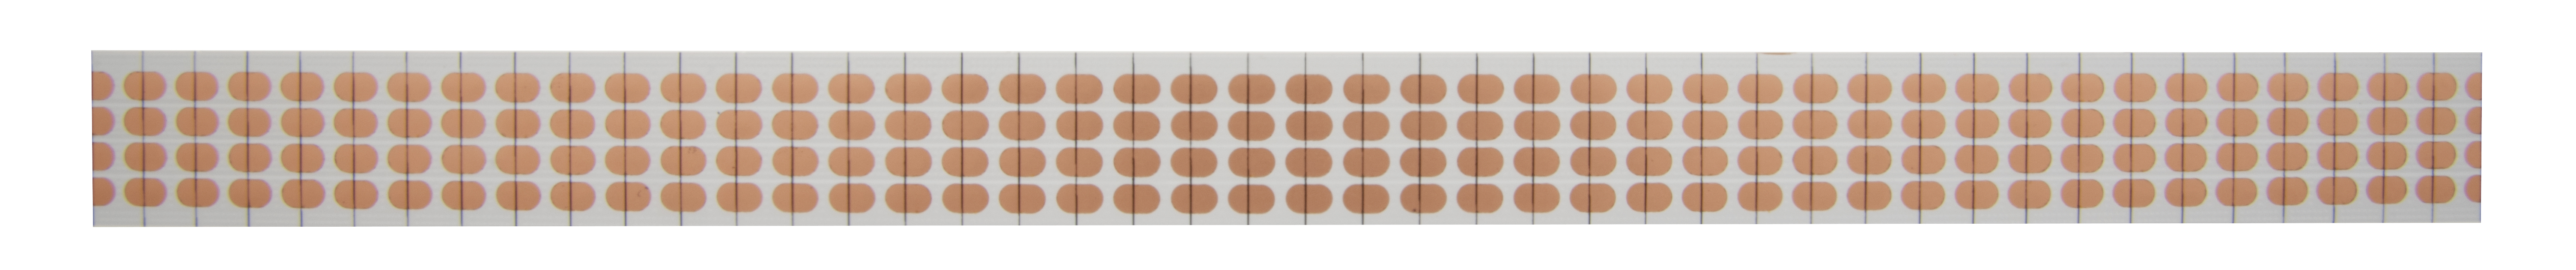 1 Stk LED Flexboard Verbindungsplatine RGB - IP20, 50cm LIFP000004